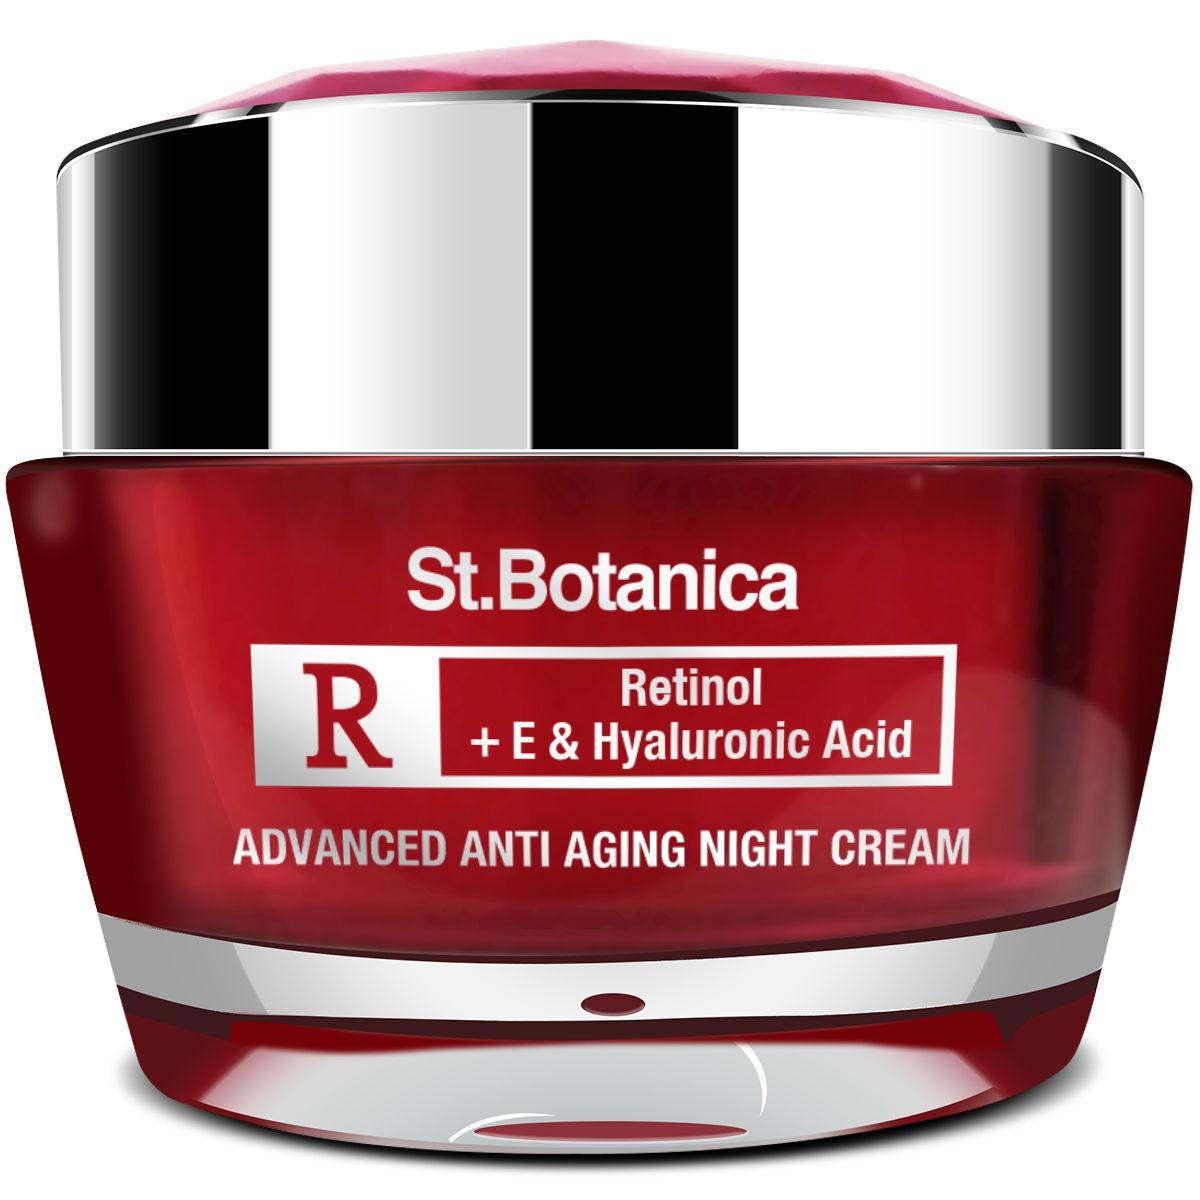 St. Botanica Retinol Advanced Anti Aging Night Cream